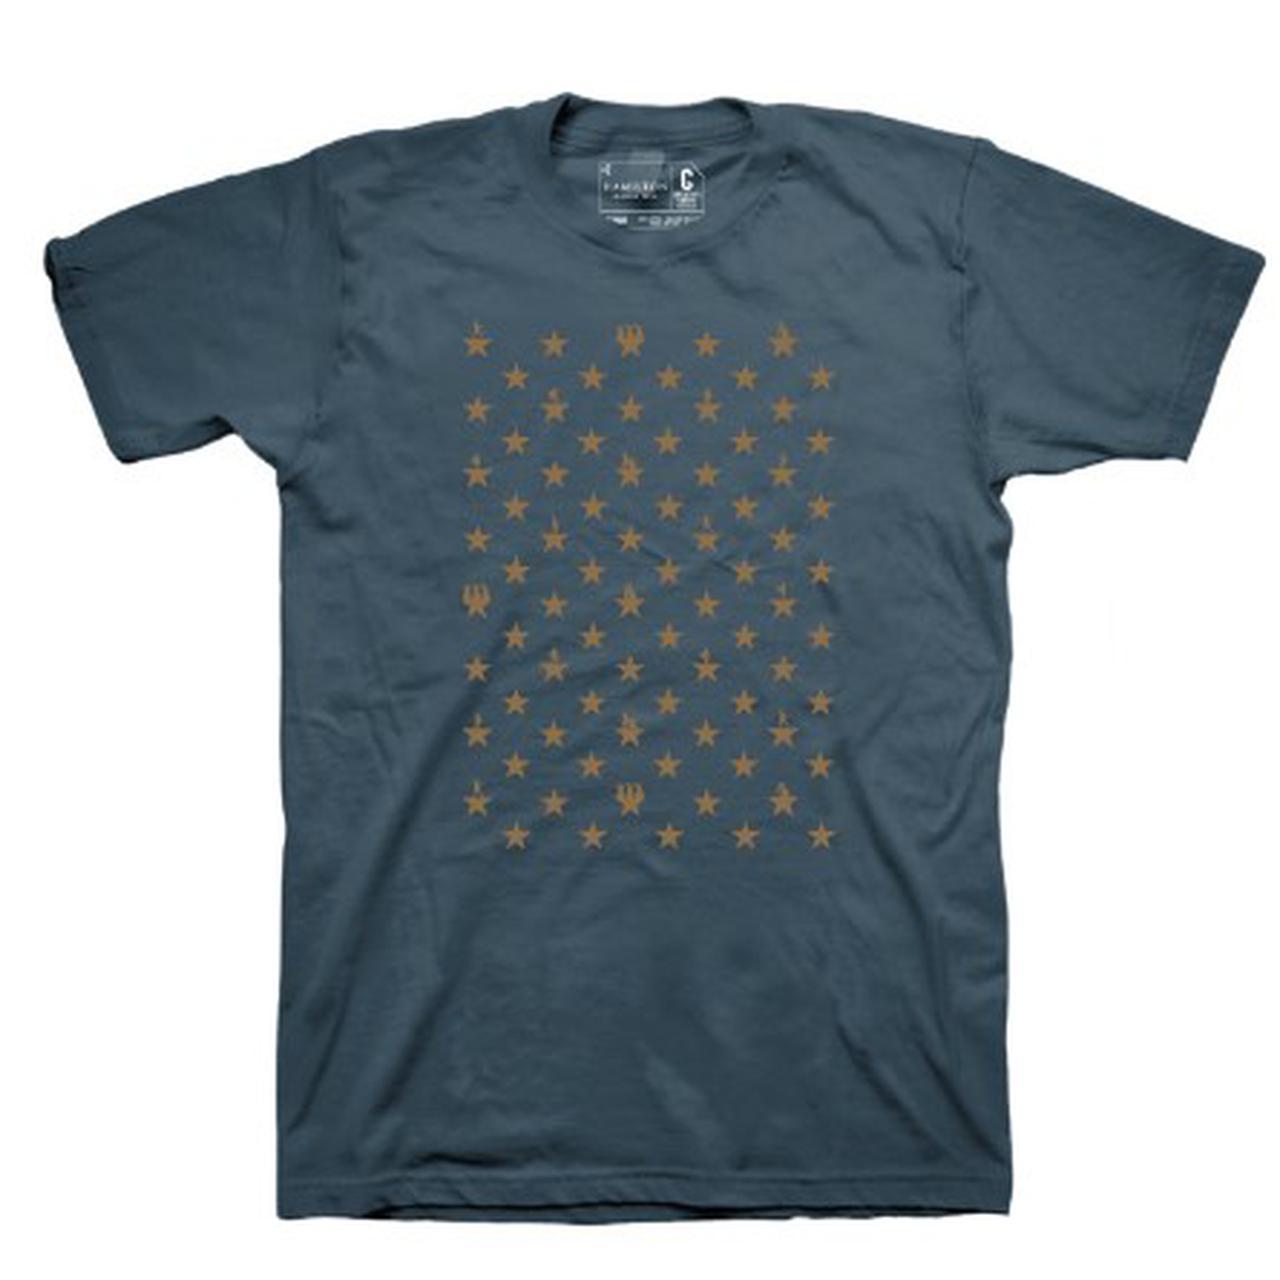 Hamilton san francisco t shirt for San francisco custom shirts